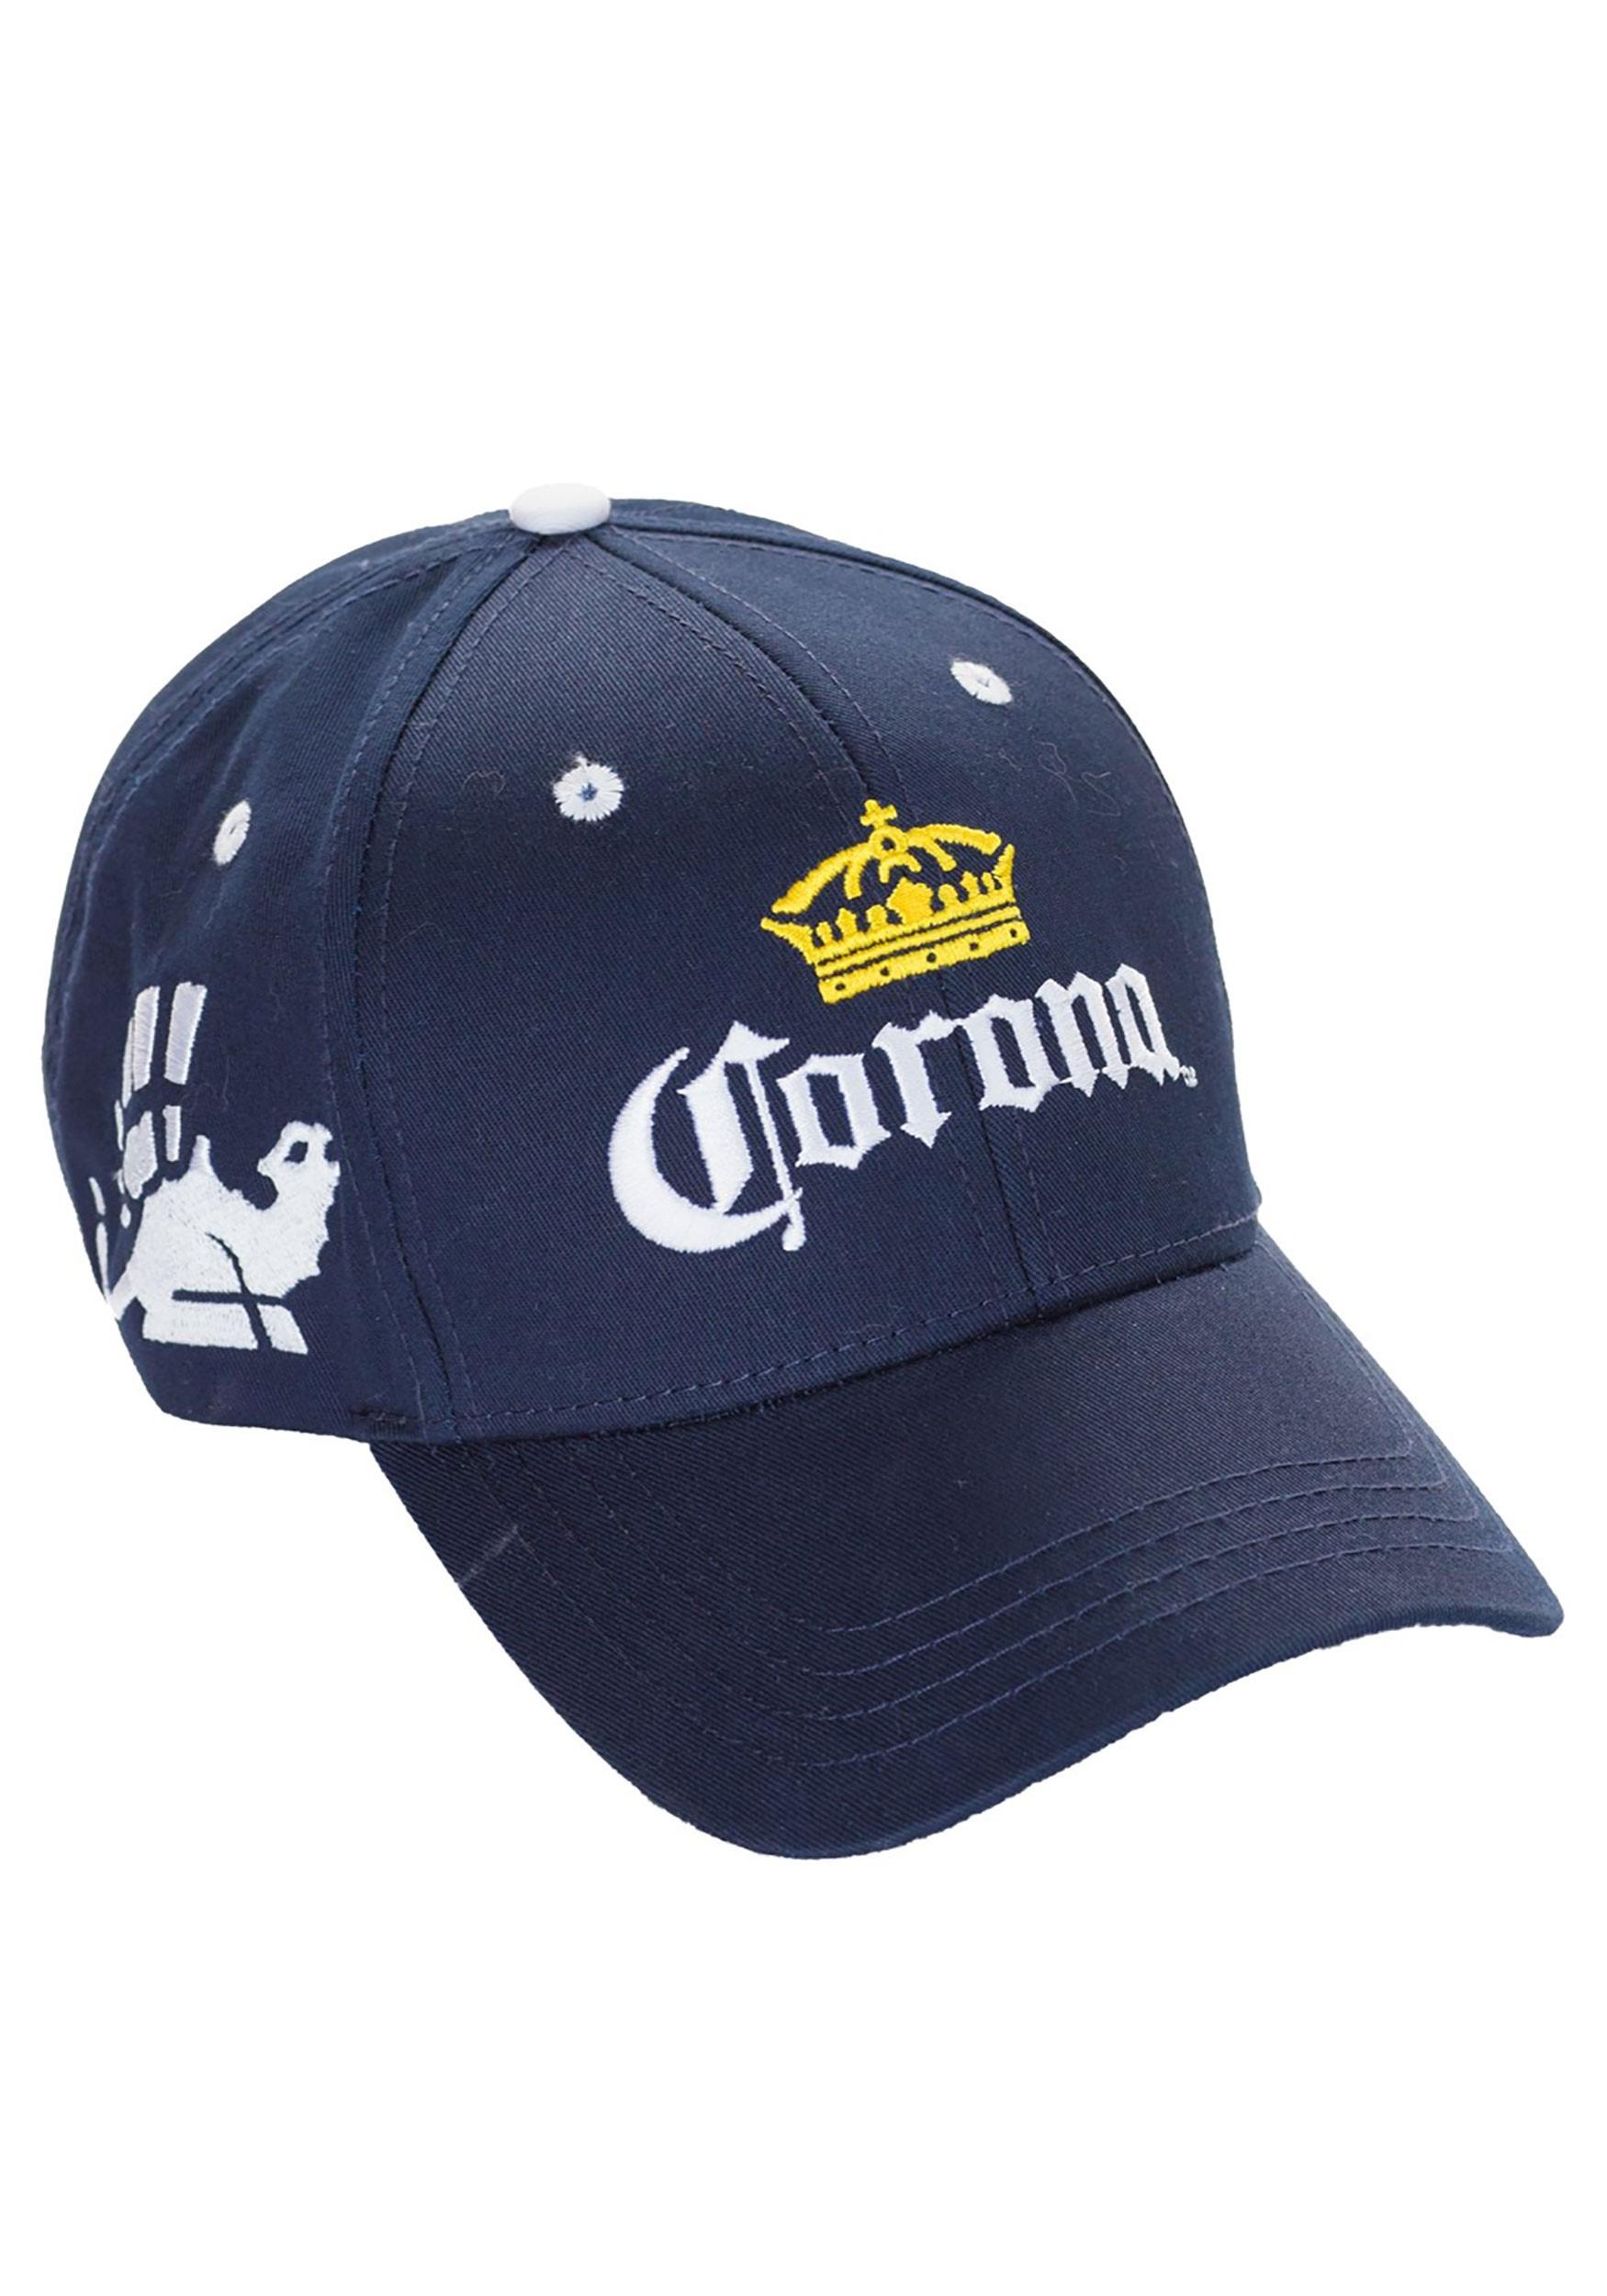 Corona Beer Blue Baseball Cap